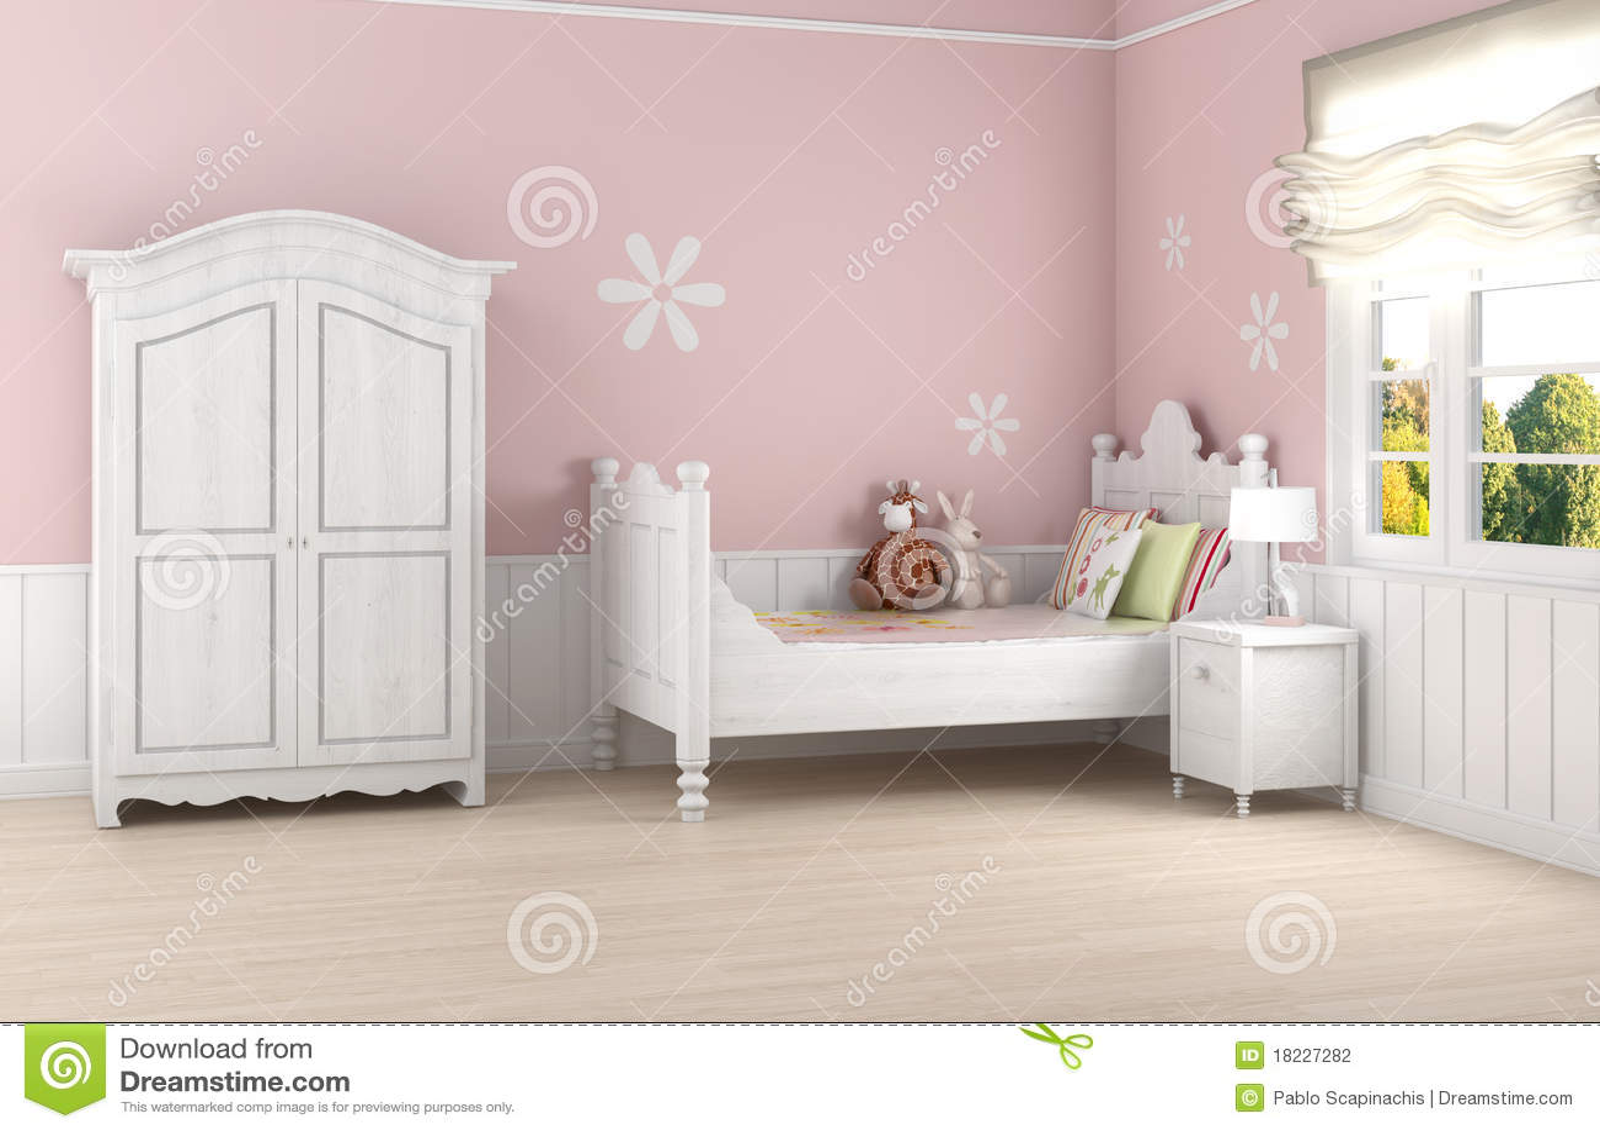 Slaapkamer meisjes ideeen. best ideeen voor meisjes slaapkamer tags